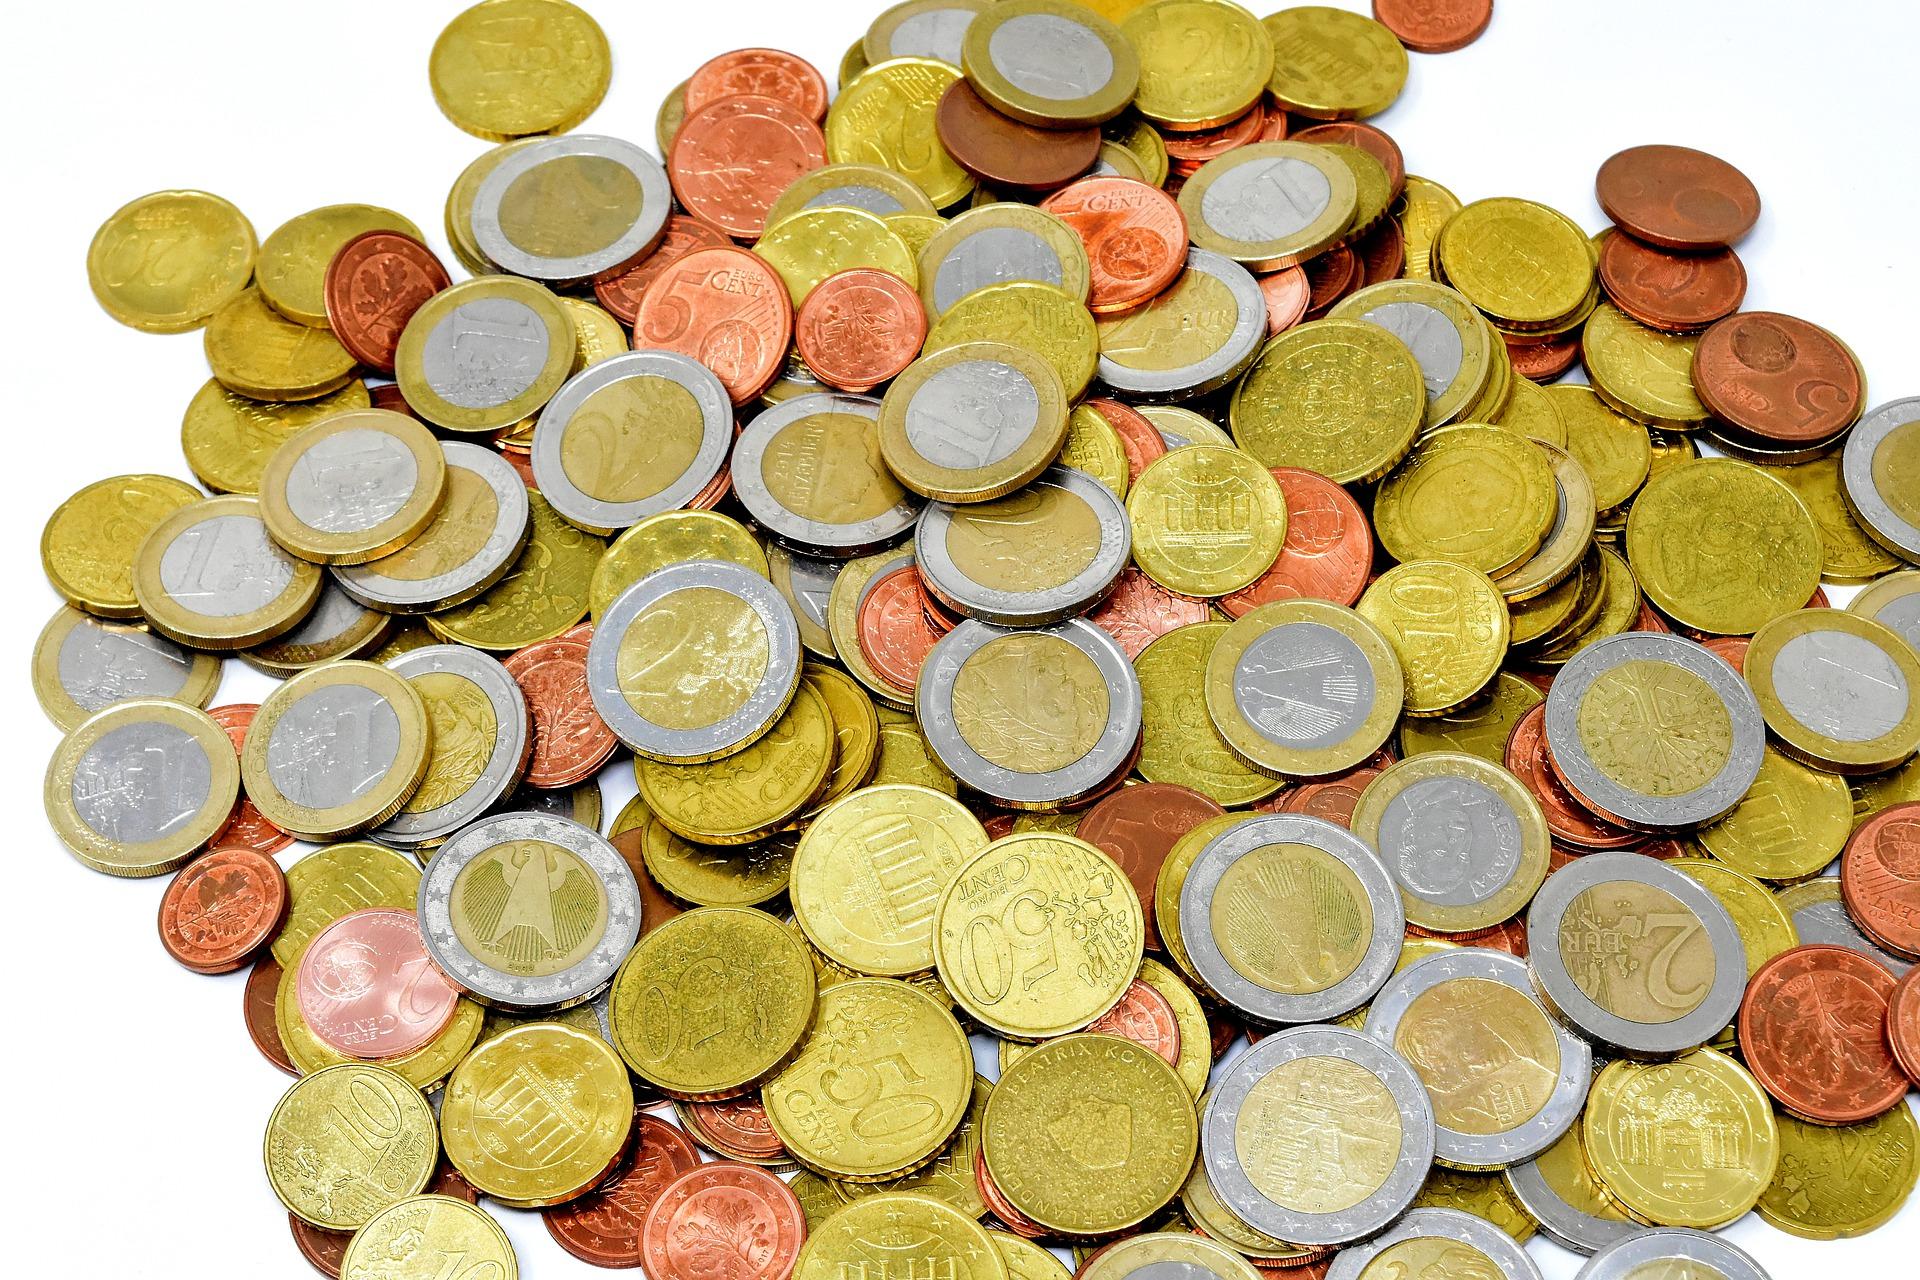 Gig economy savings